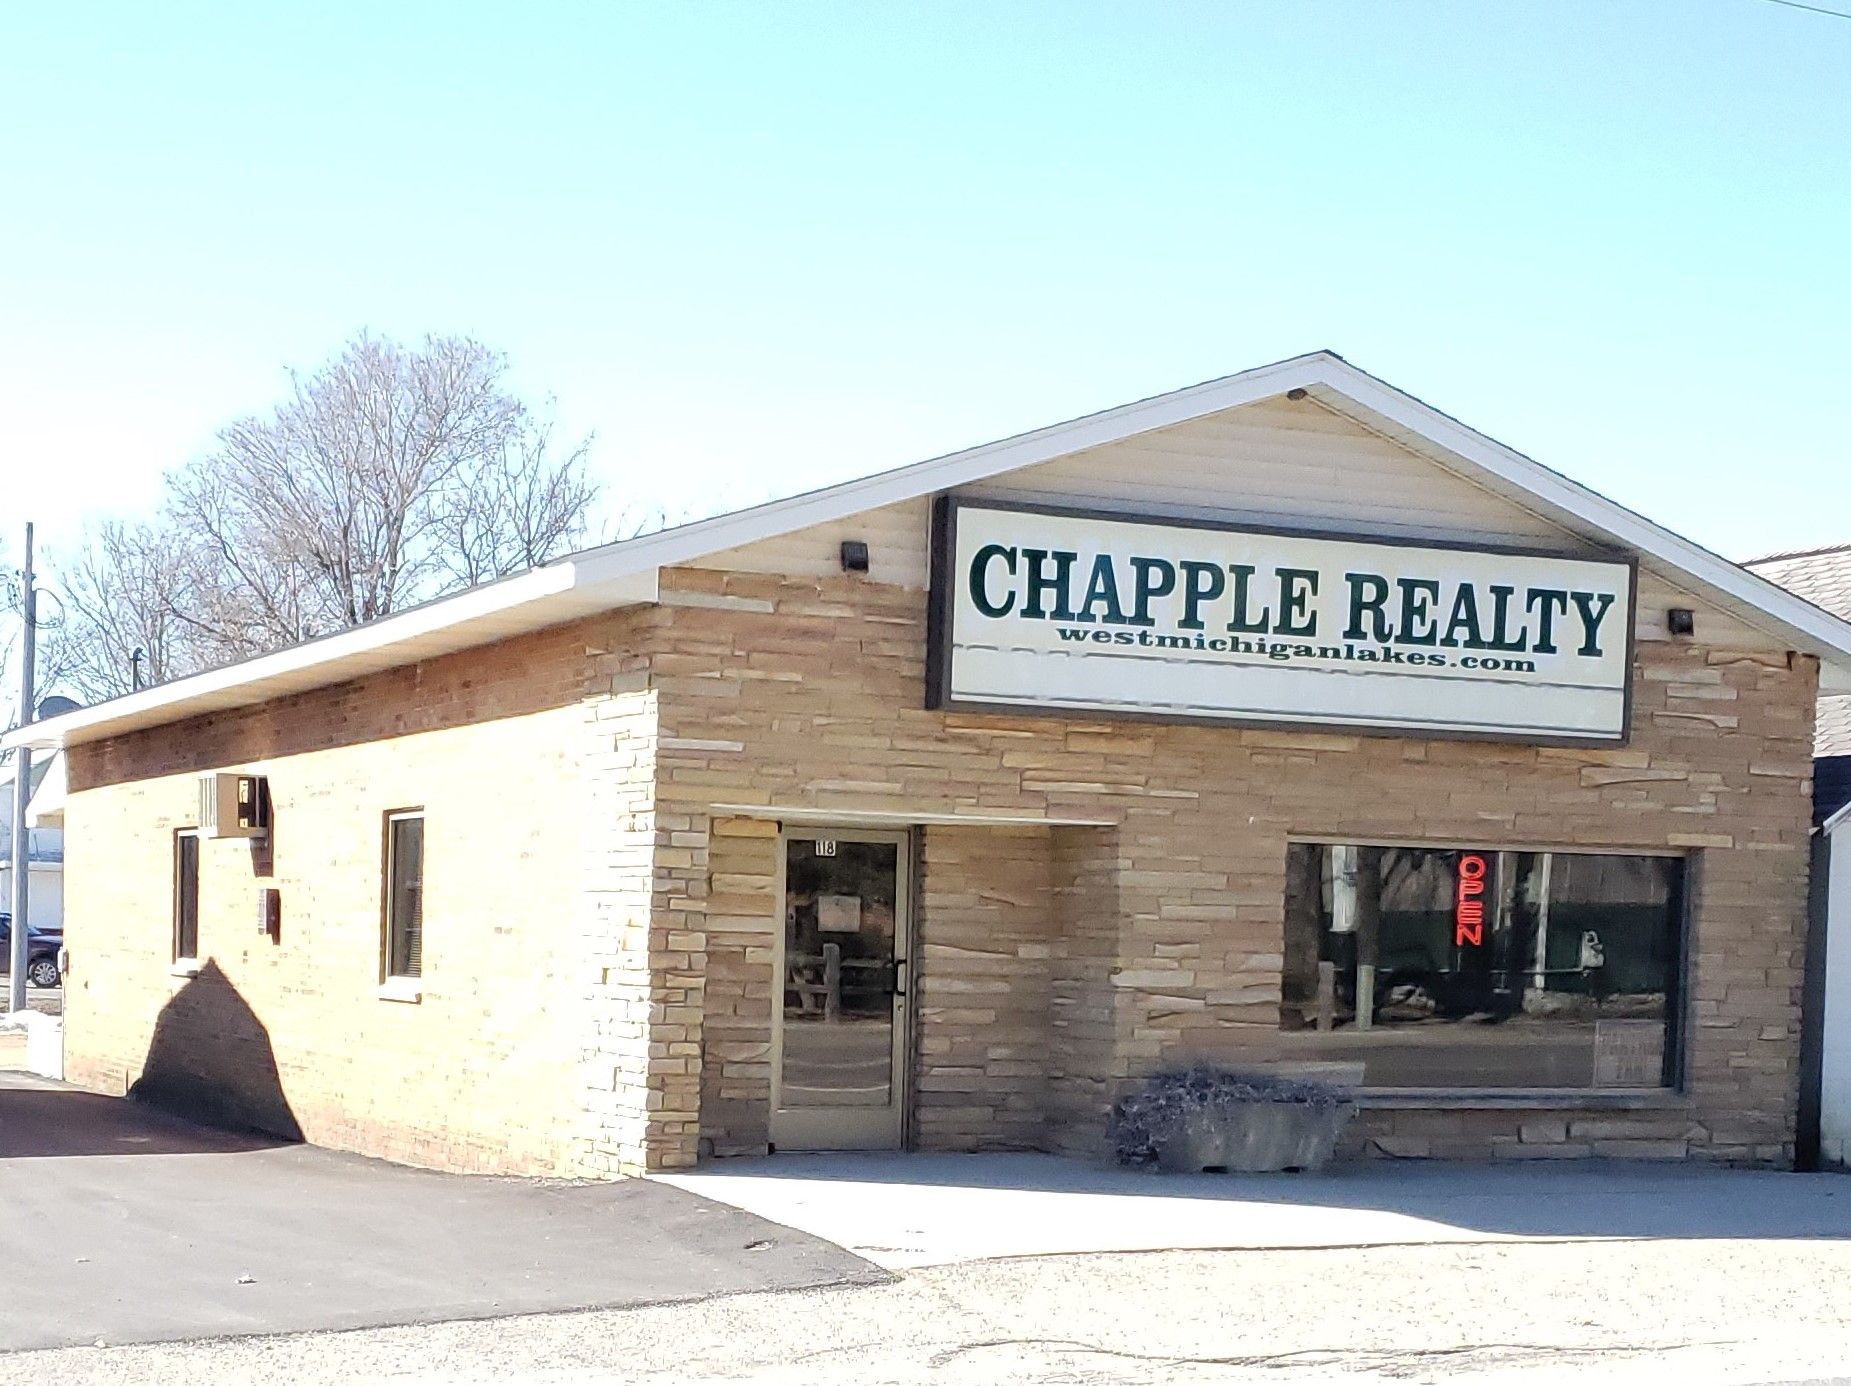 Chapple Realty